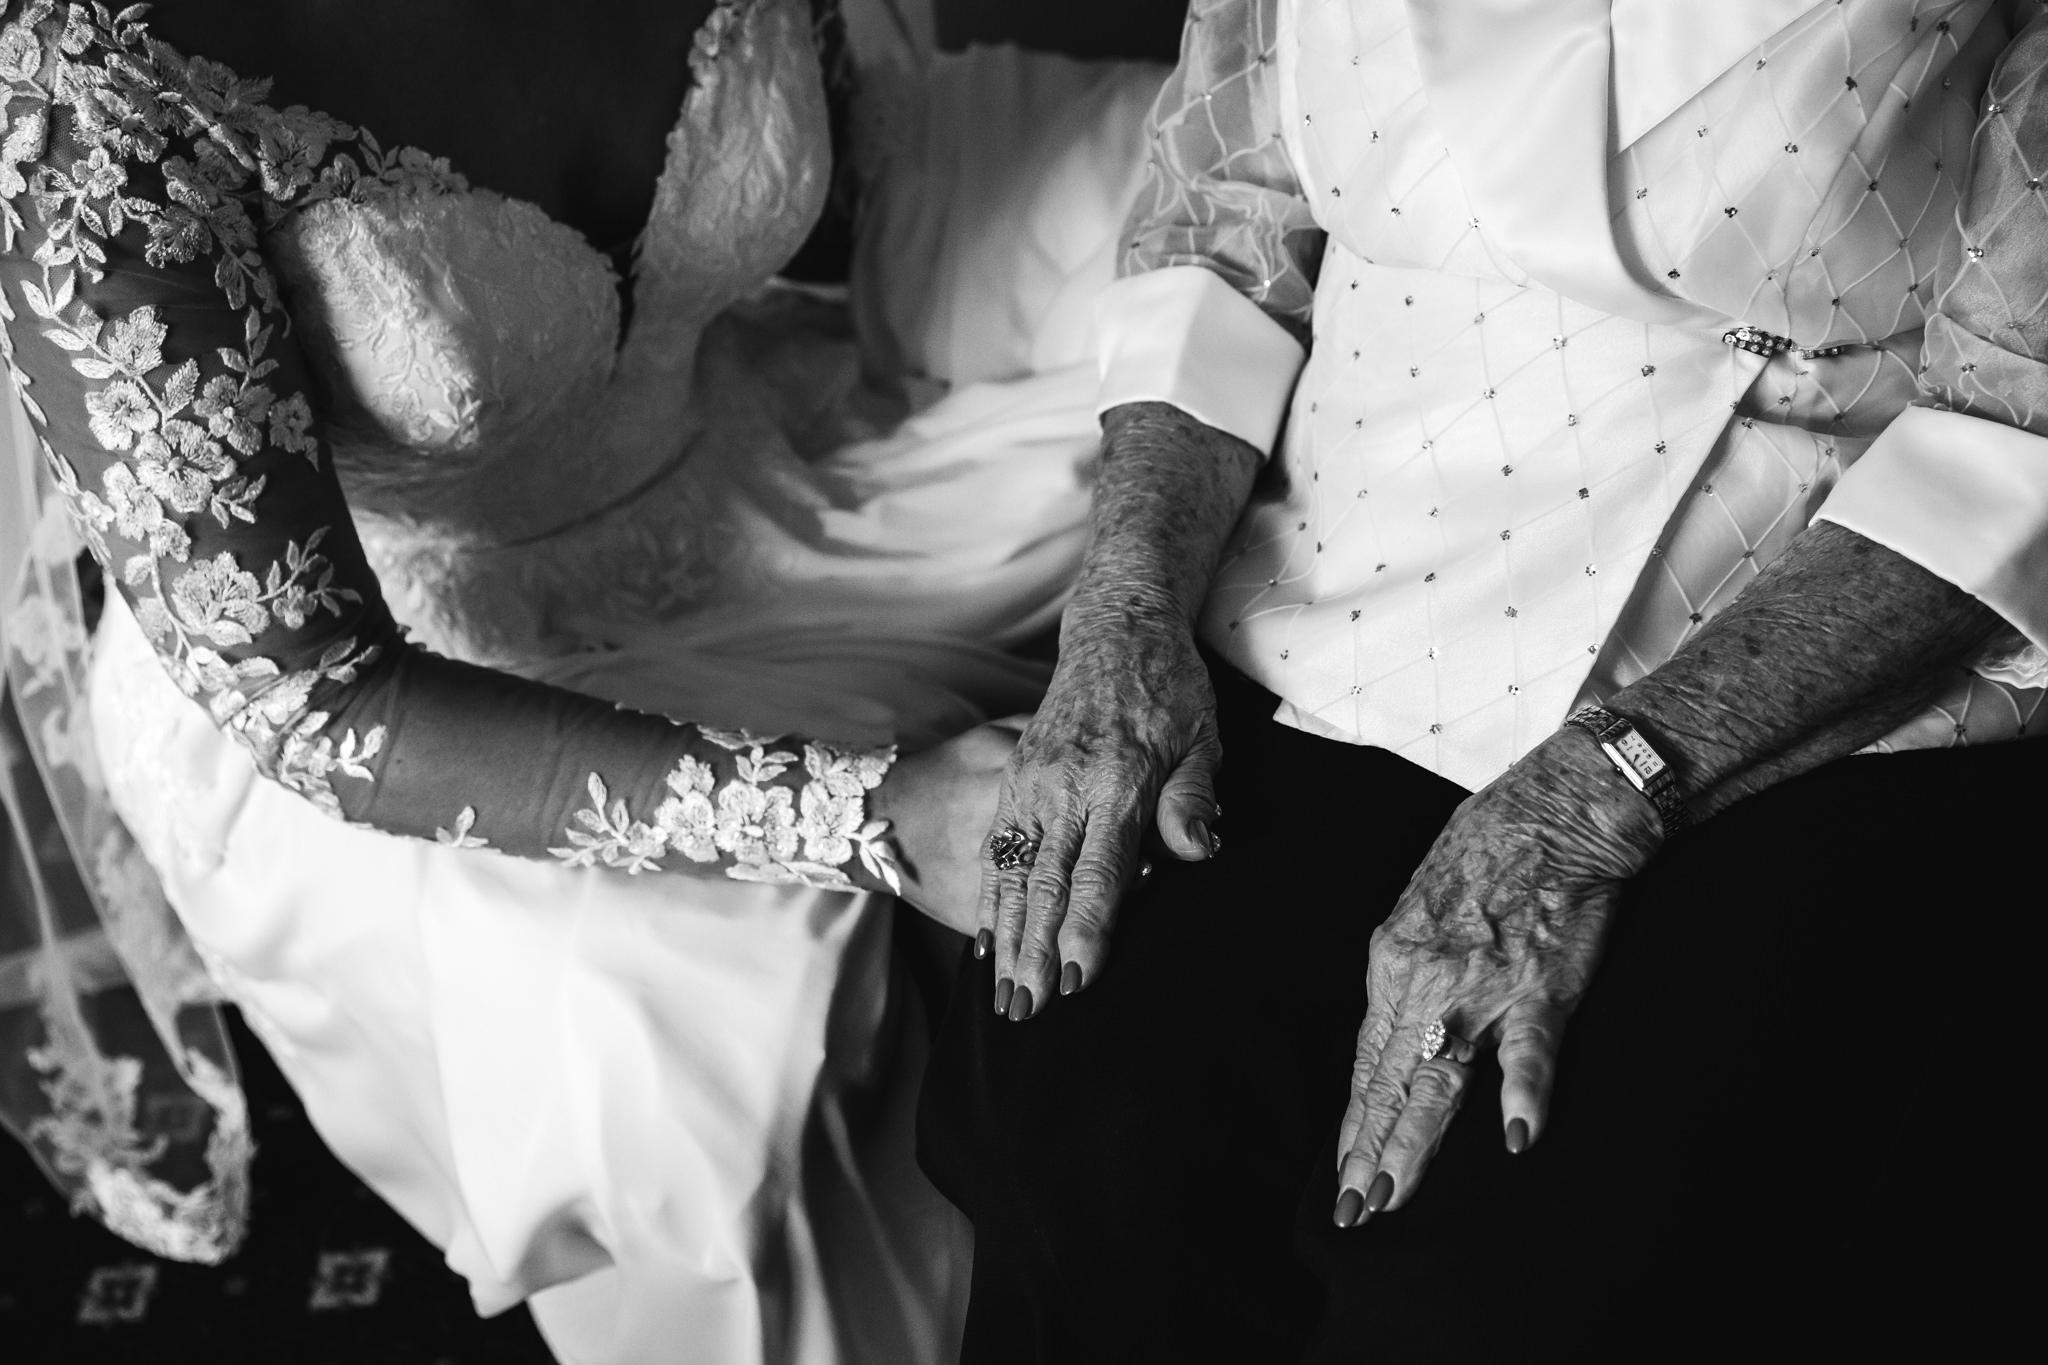 phantom-canyon-brewery-colorado-springs-wedding-photographer-32.jpg